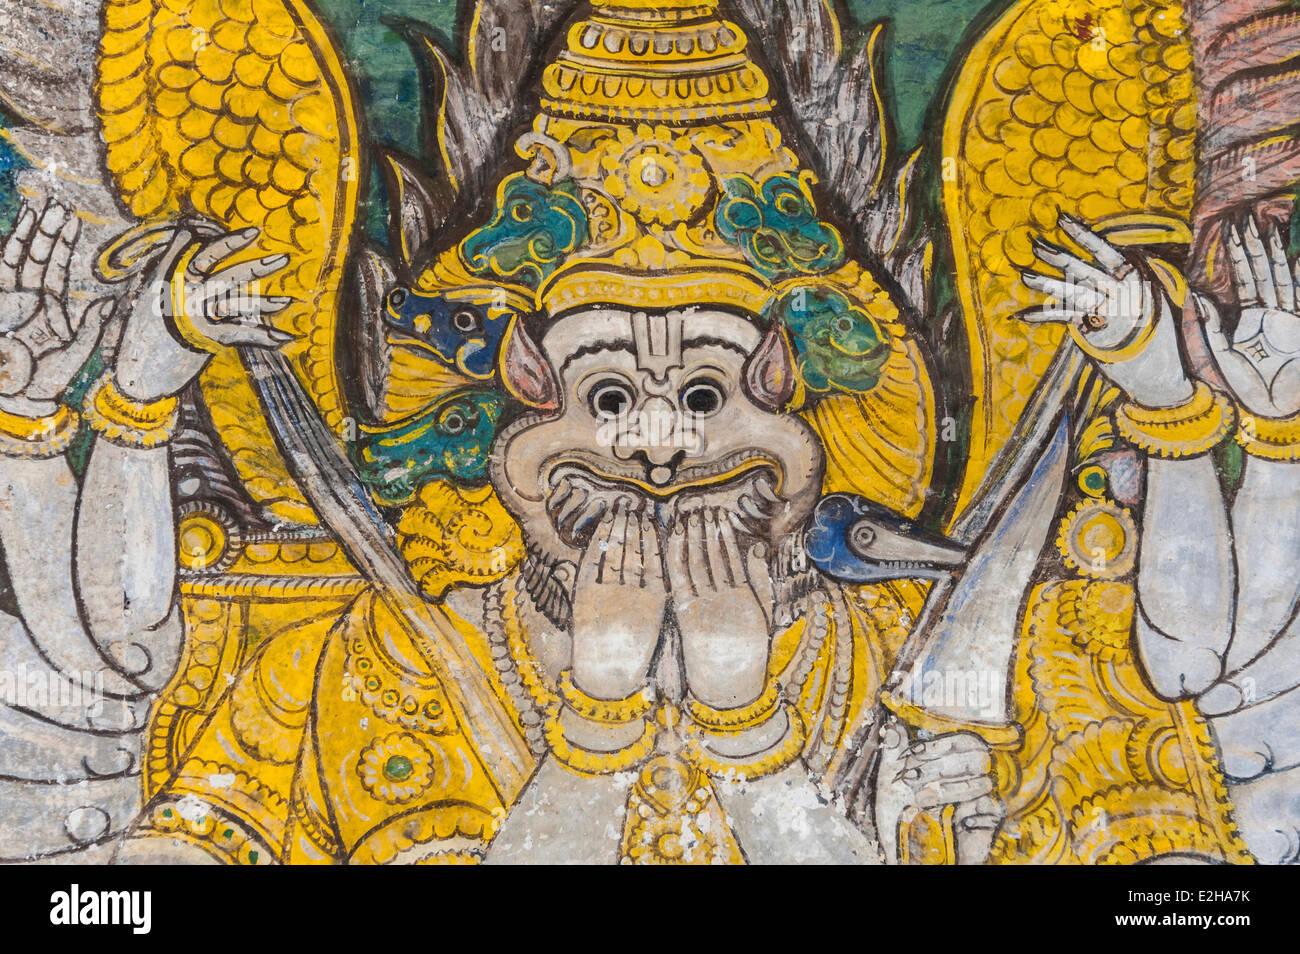 Mural, Hindu deity, Srirangam temple complex, Tiruchirappalli, Tamil Nadu, India - Stock Image